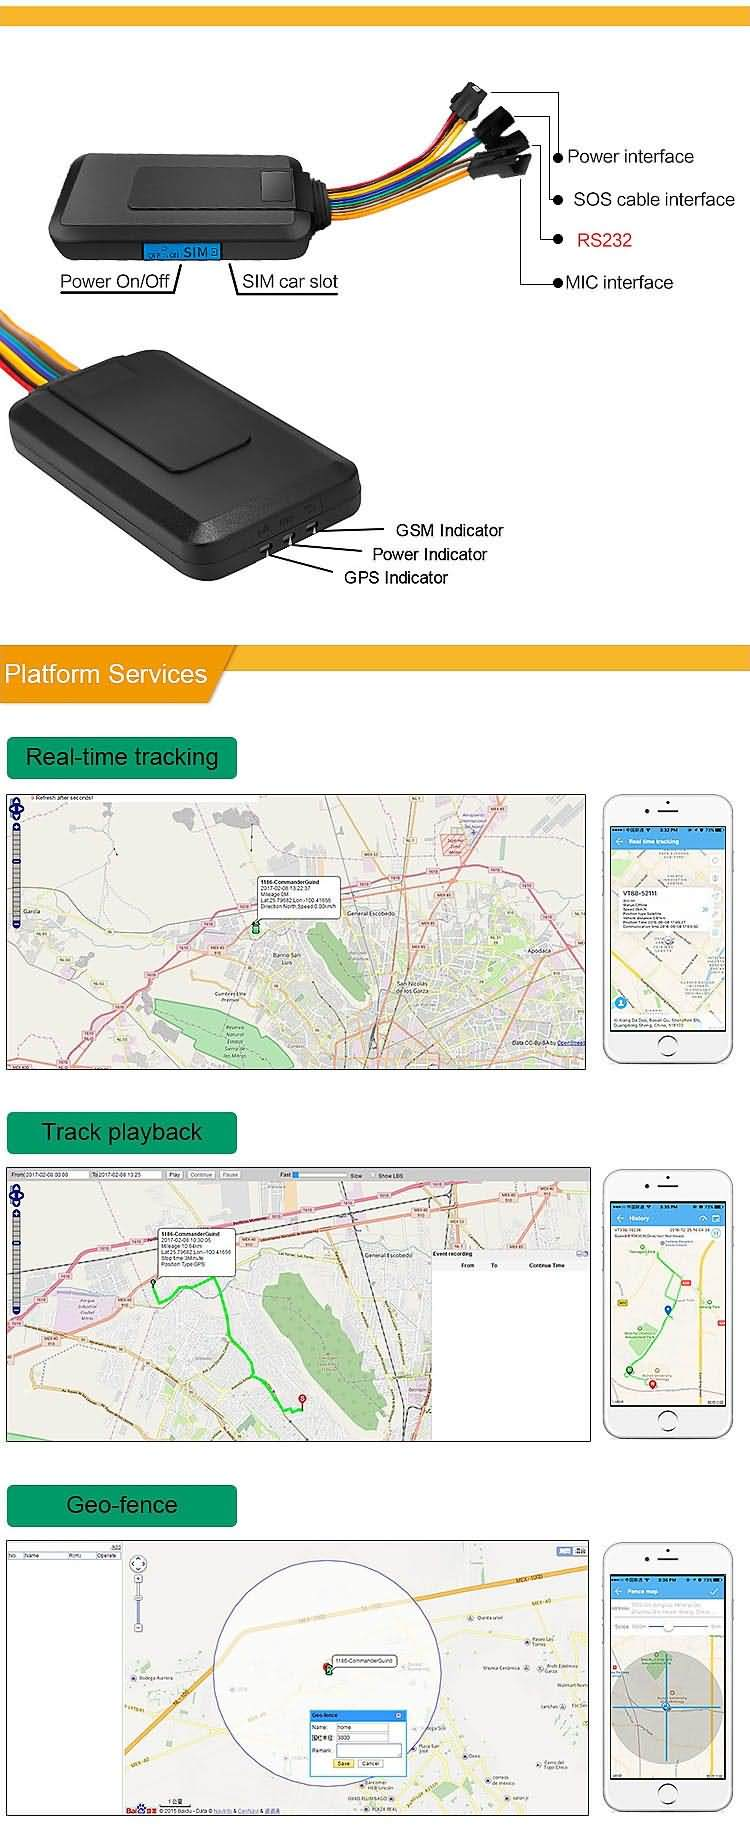 gps tracker gt06 function